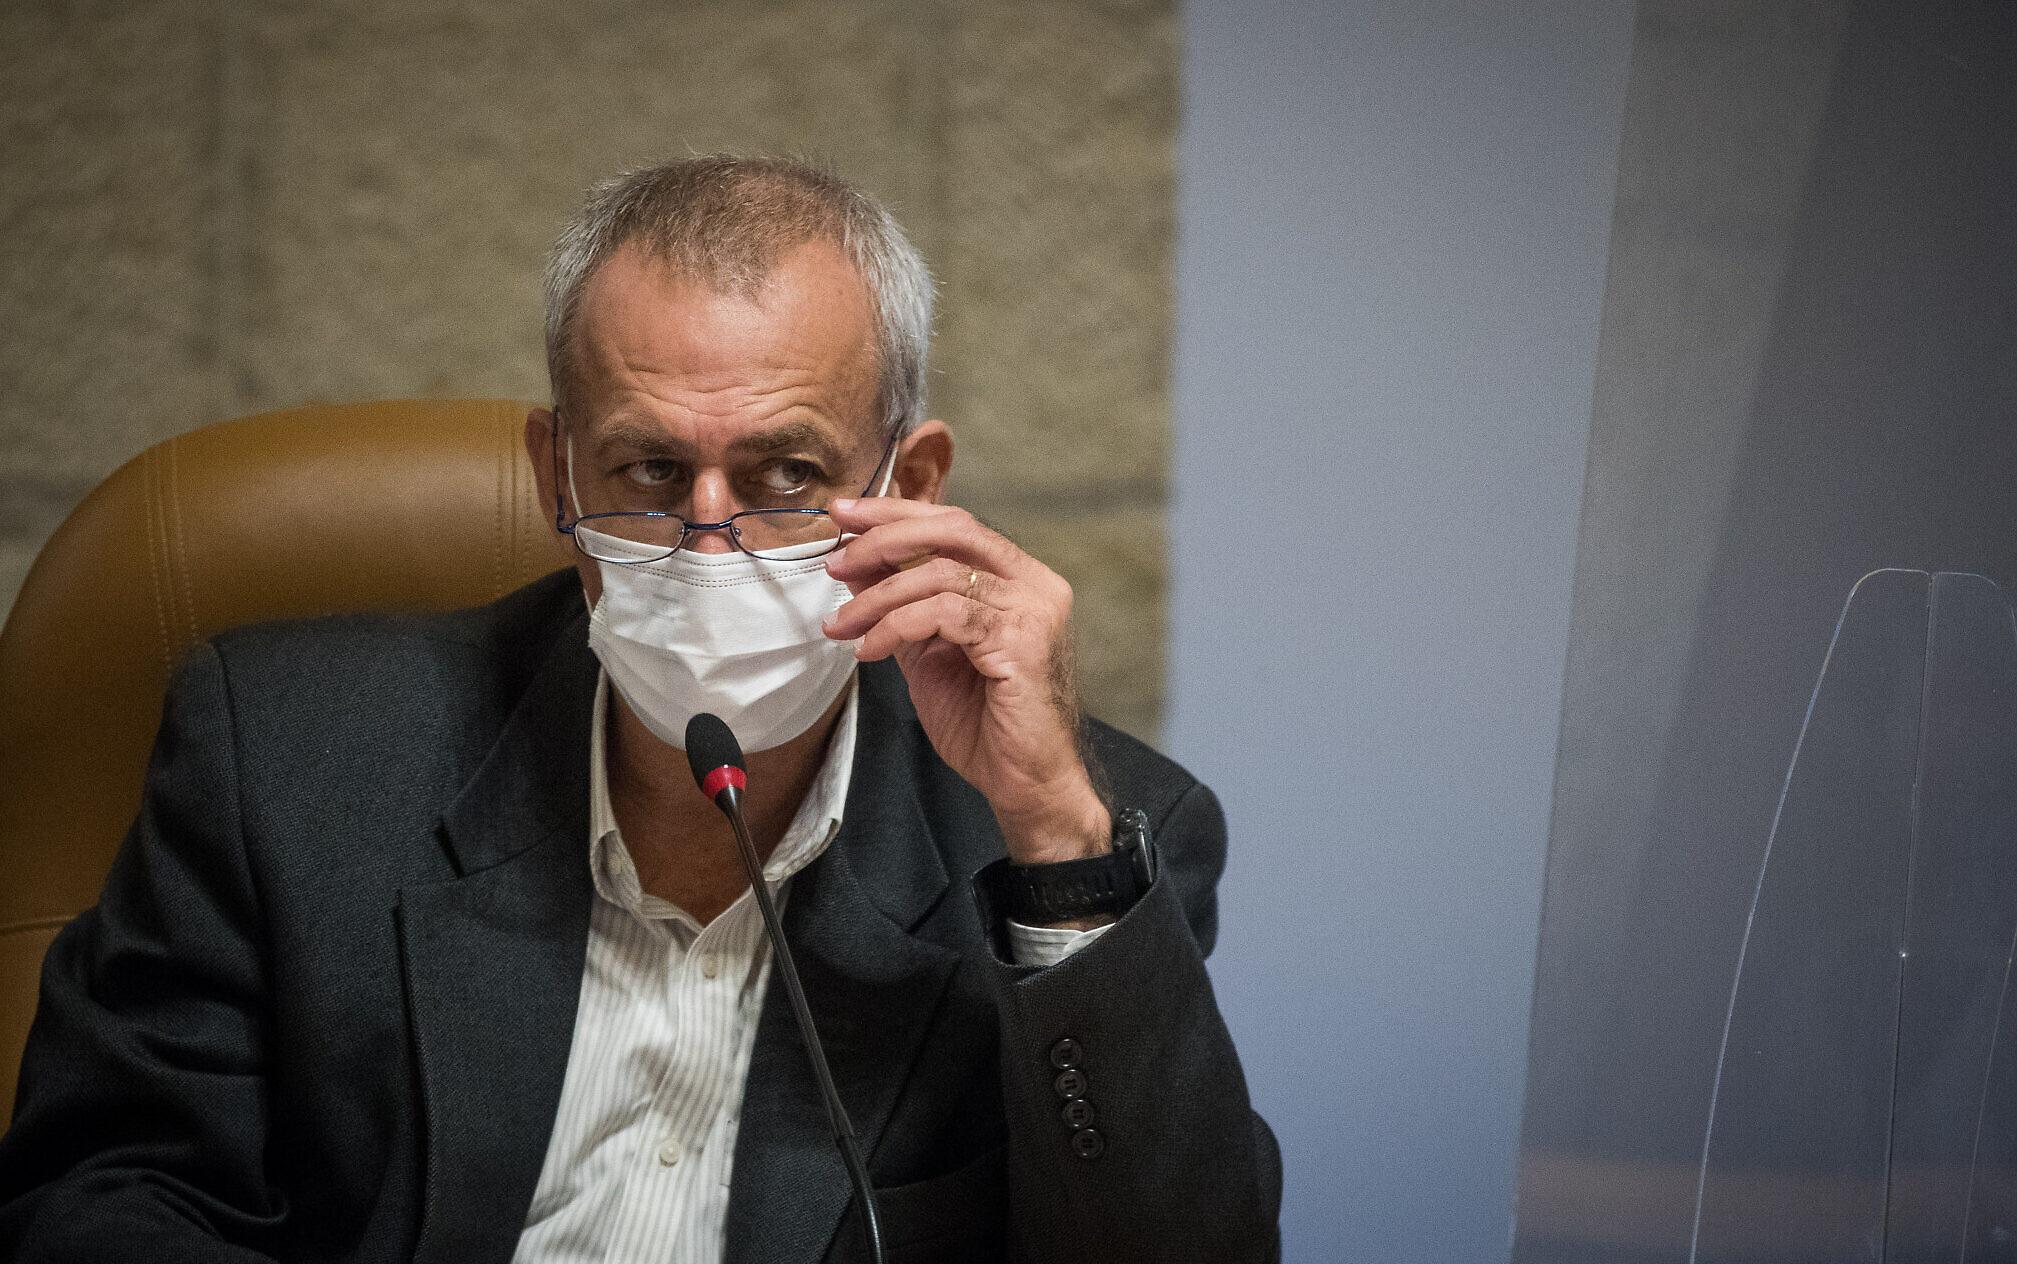 Israel's coronavirus czar Nachman Ash visits the Jerusalem Municipality, November 22, 2020. (Yonatan Sindel/Flash90)